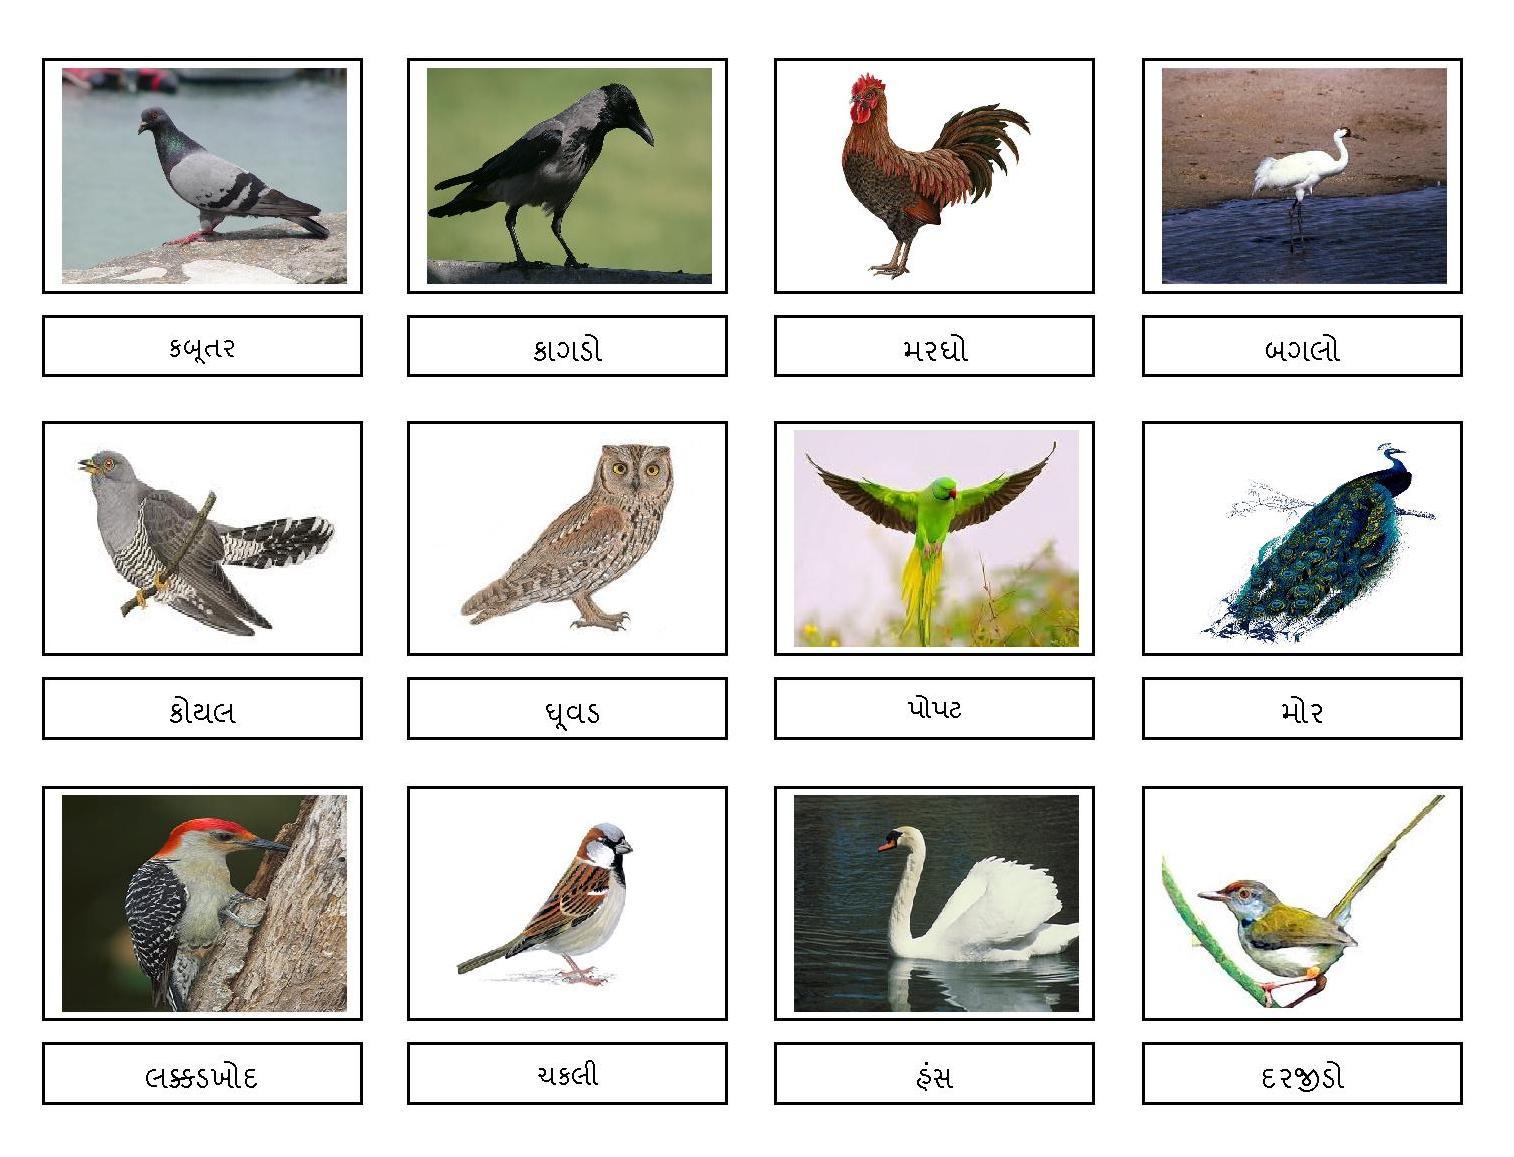 Gujarati Animal Worksheets Printable Worksheets And Activities For Teachers Parents Tutors And Homeschool Families